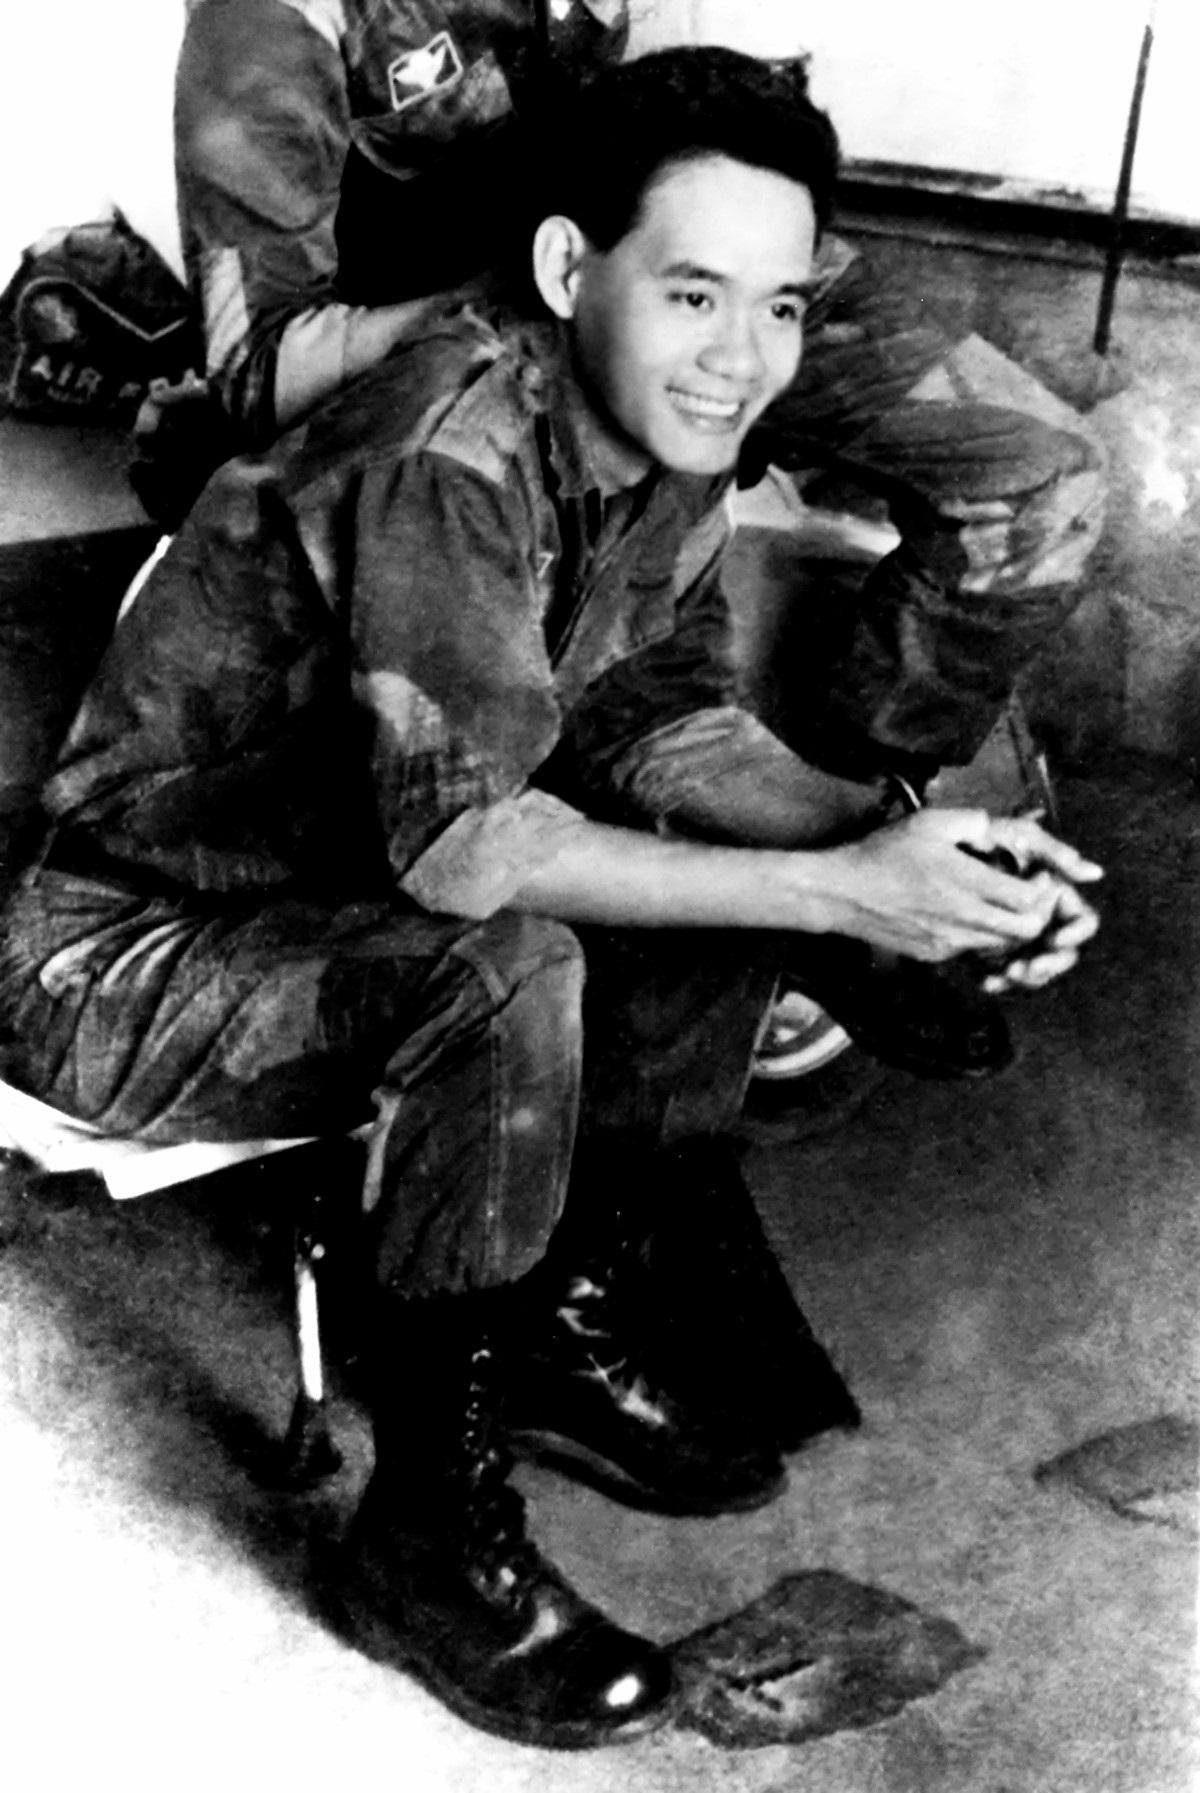 Young Phan Nhat Nam